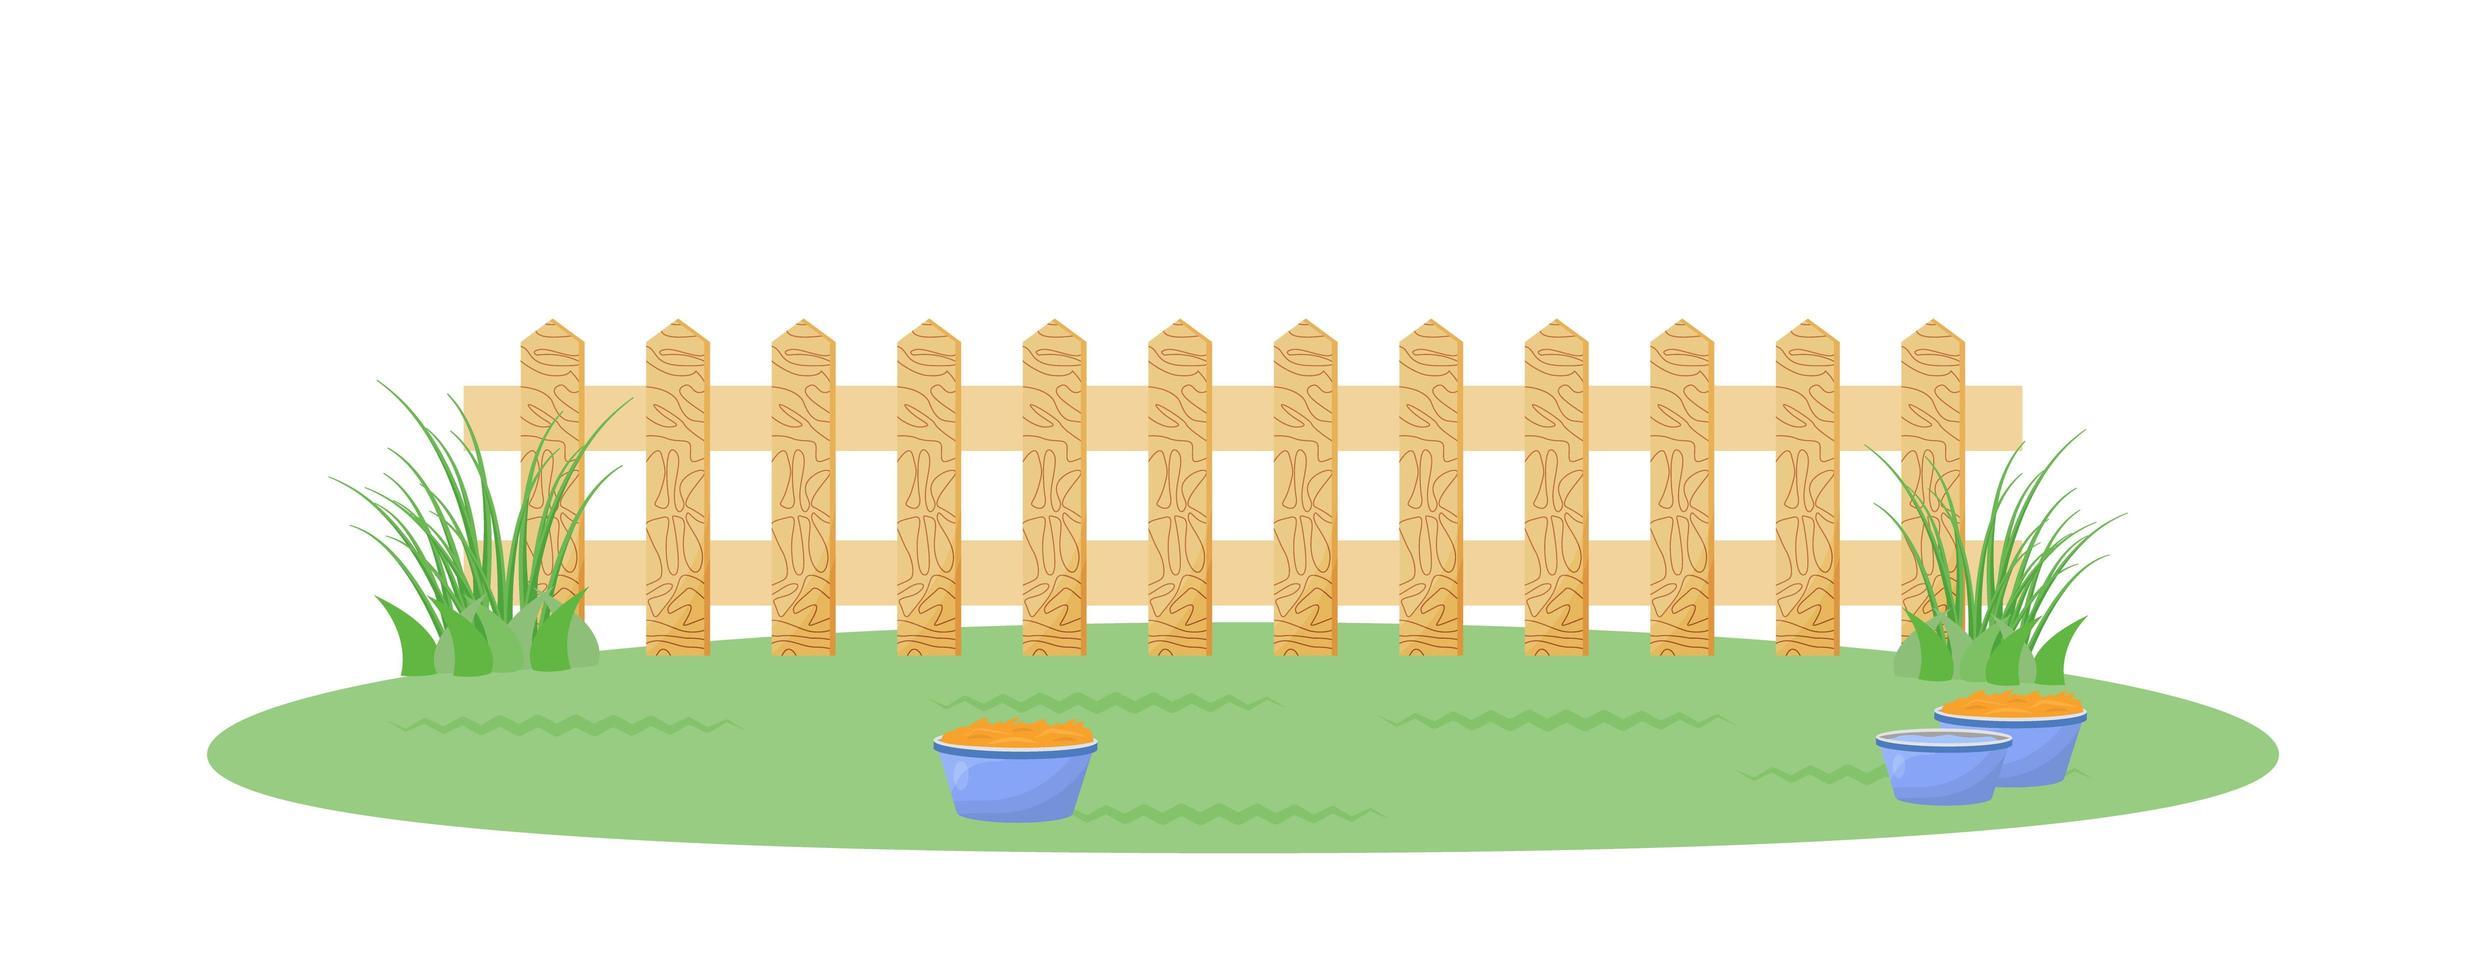 Hinterhof mit Zaun vektor